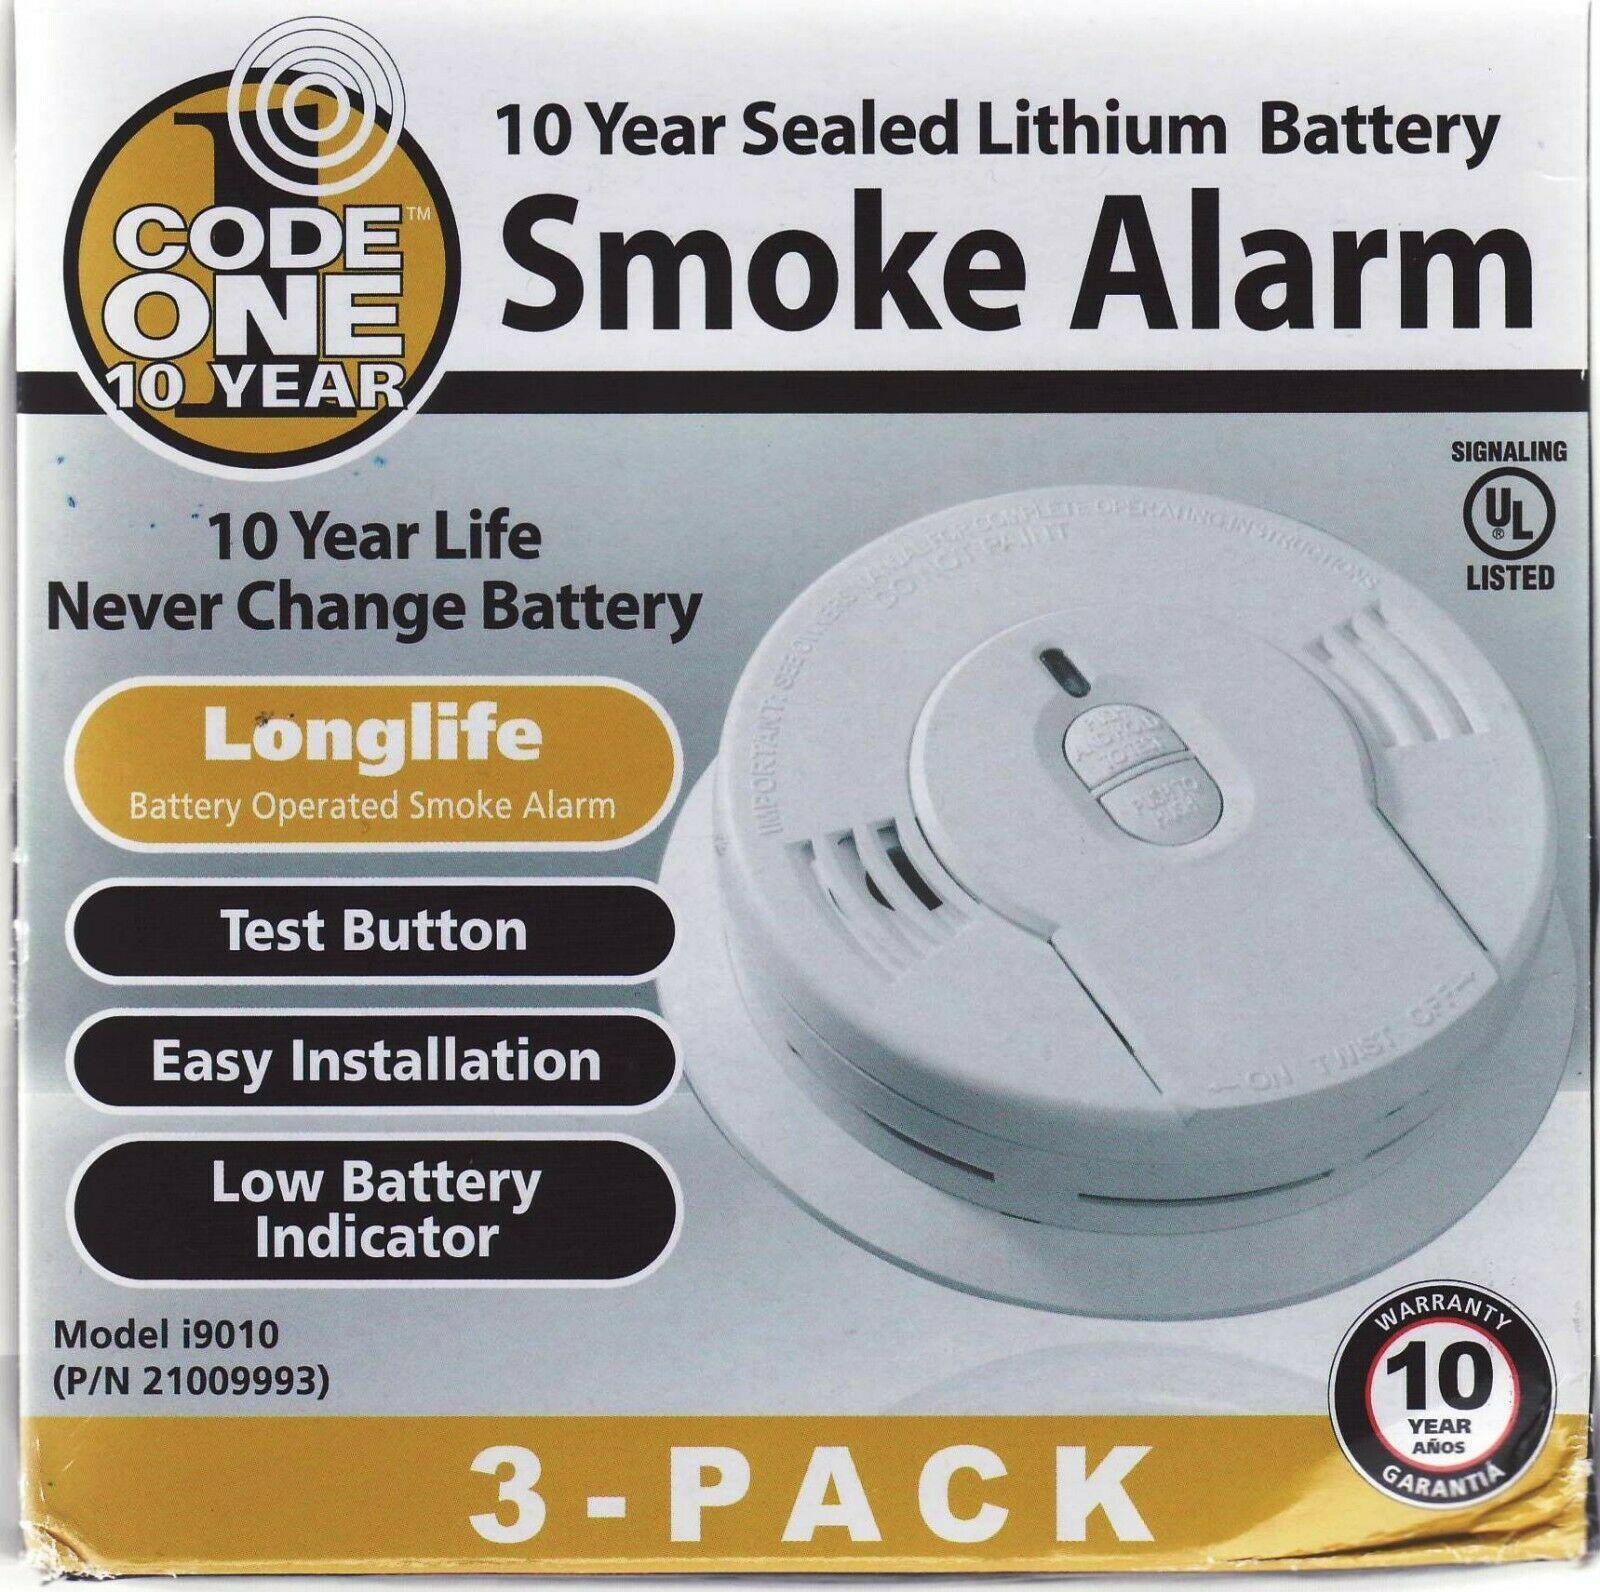 Smoke Alarm Smoke Alarm Ideas Smokealarm Firealarm Home Smoke Alarm Detector Sensor 10 Year Lithium Ion Batt Smoke Alarms Fire Alarm Carbon Monoxide Alarms